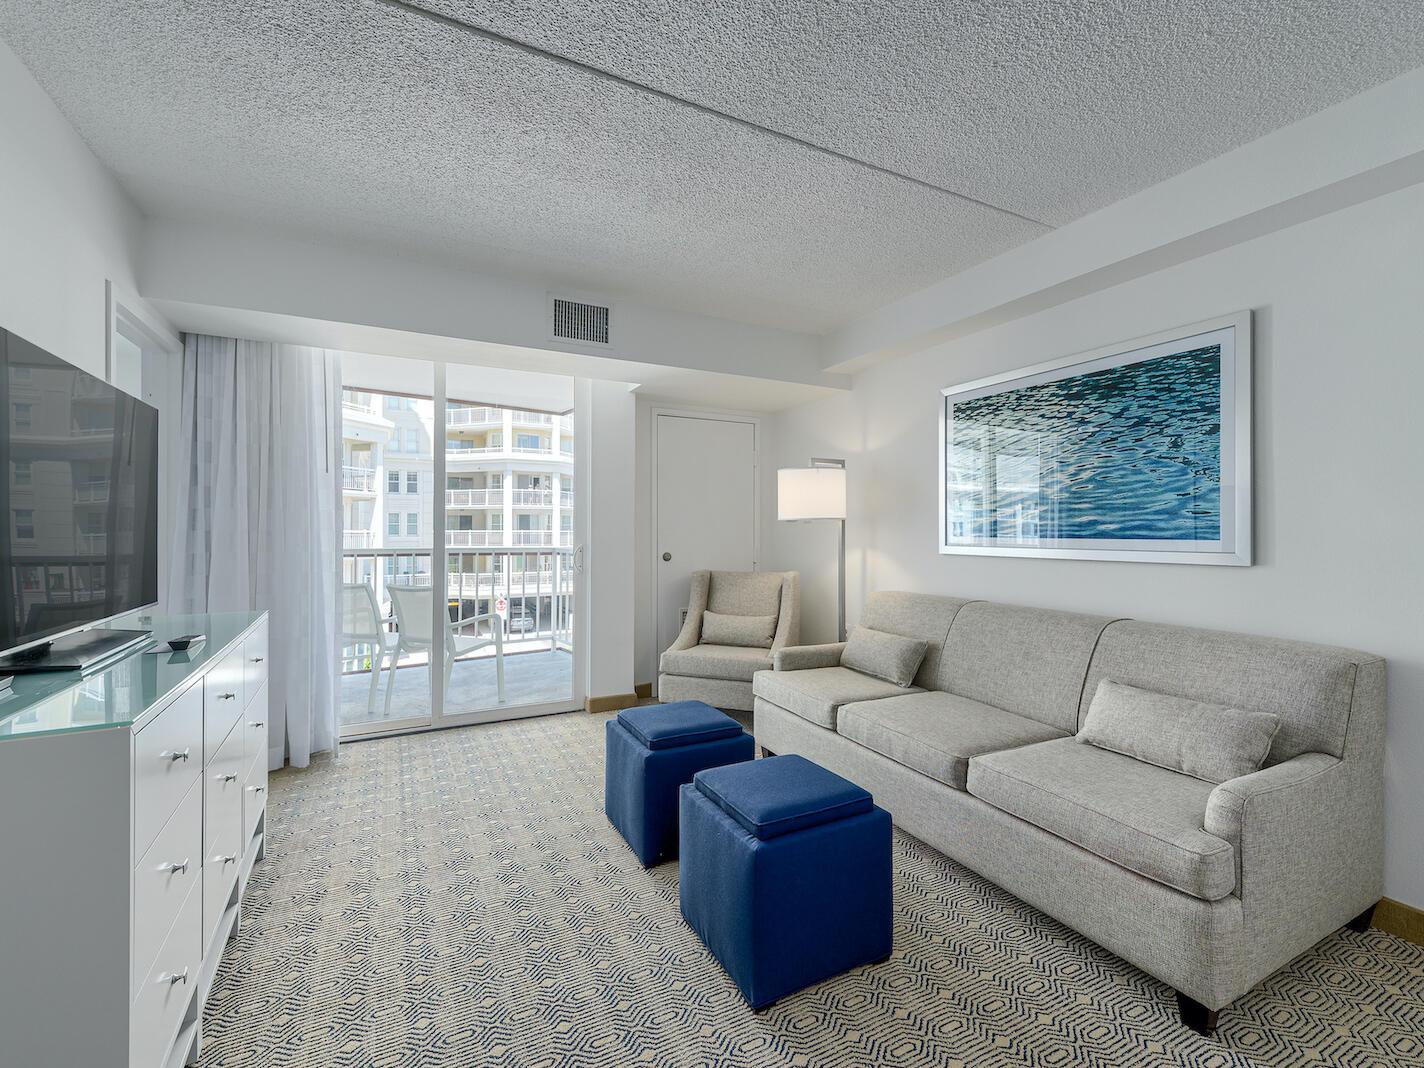 ICONA Diamond Beach Premium King Suite Resort in Wildwood Crest, NJ